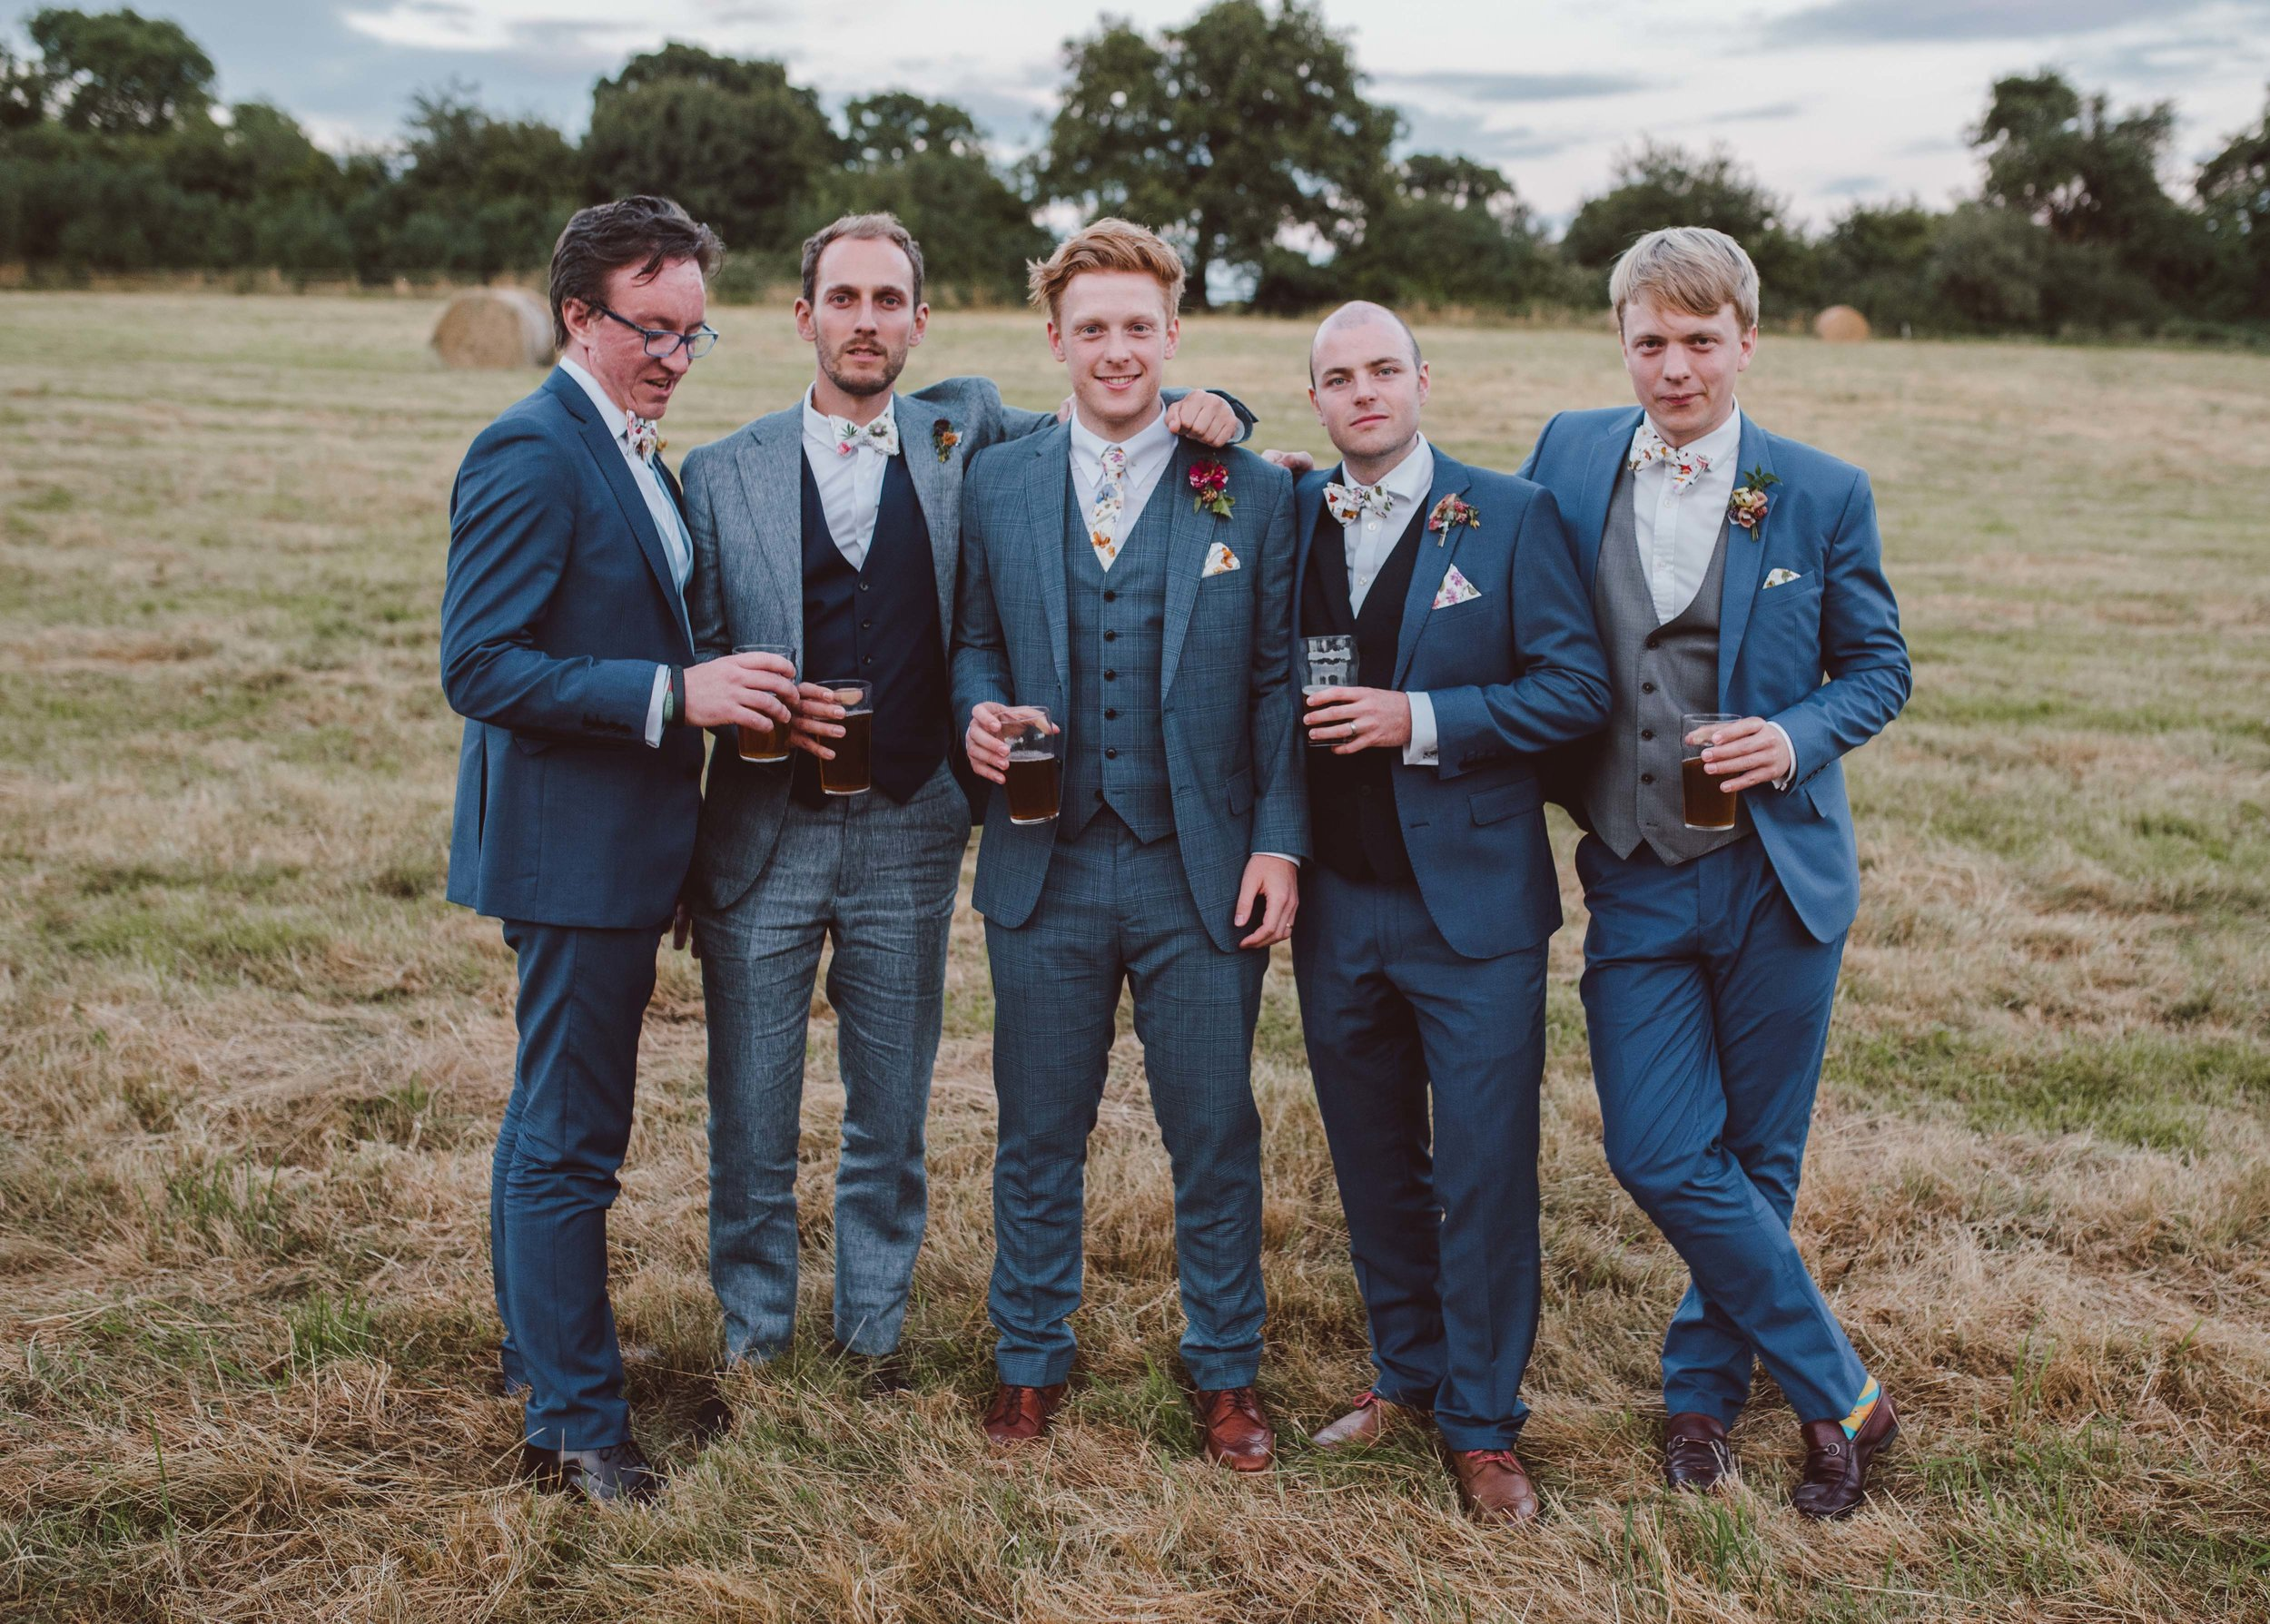 Summer wedding groomsmen mismatched style